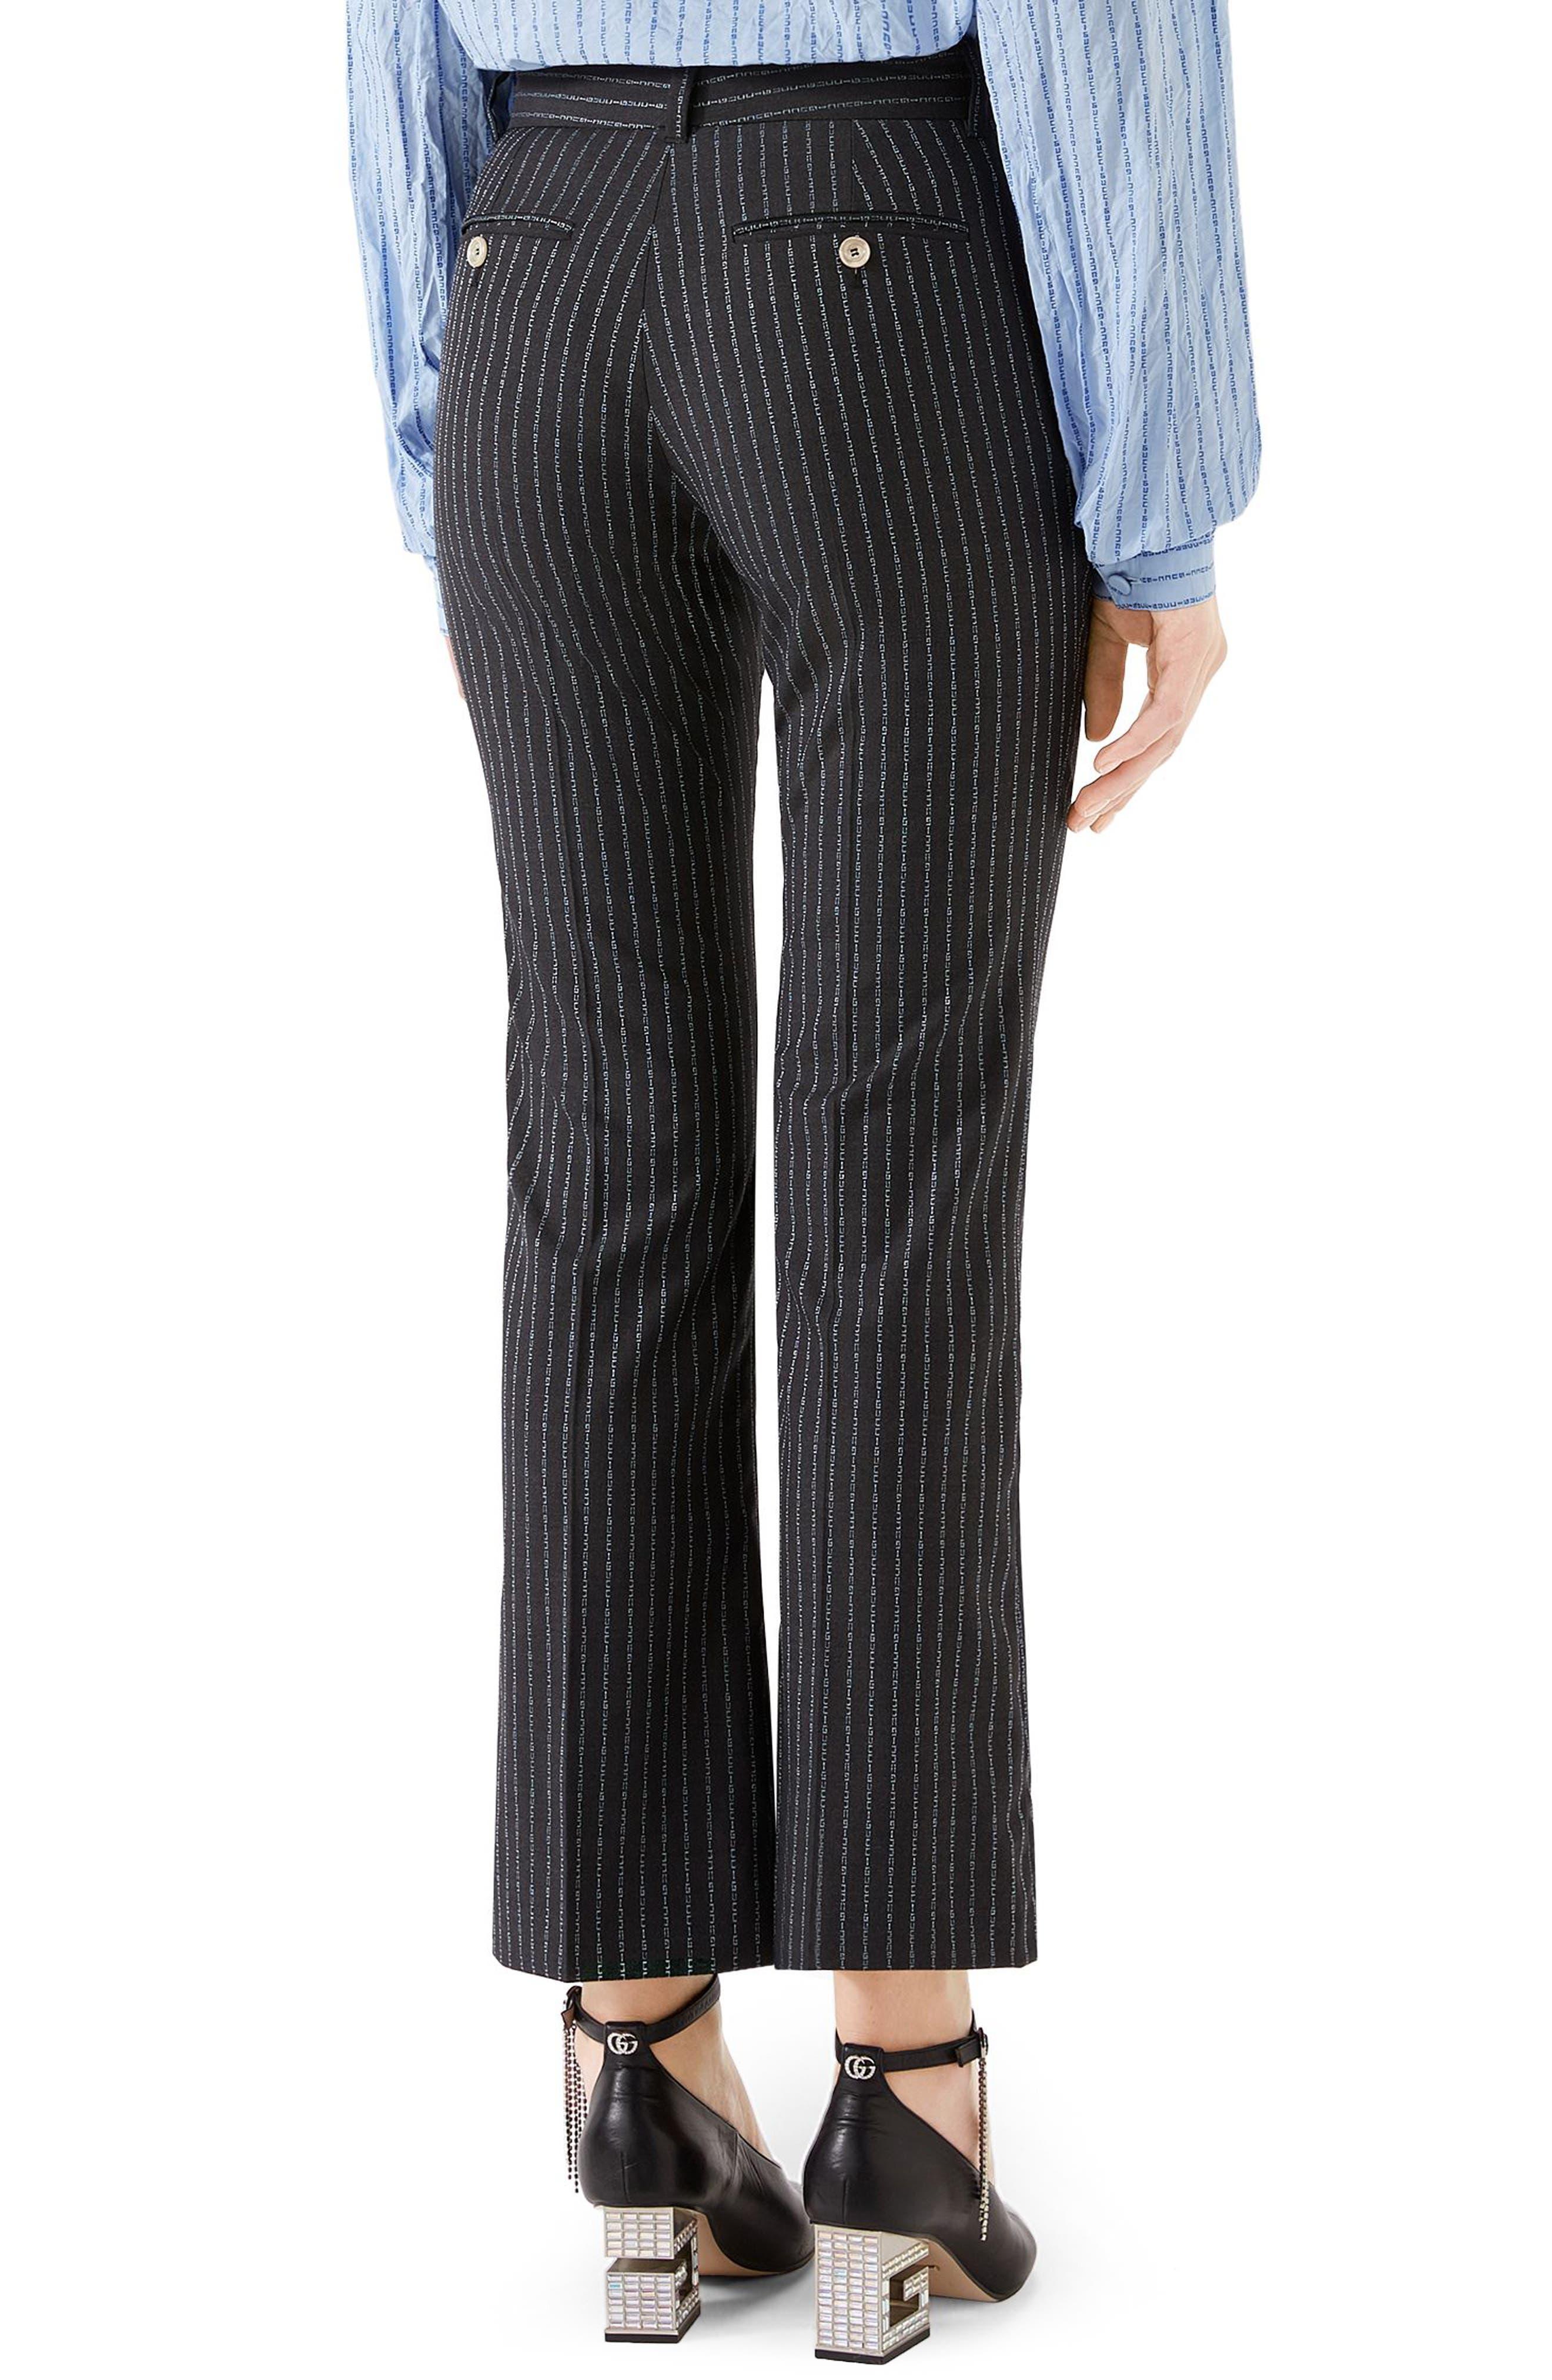 GUCCI,                             Gucci Stripe Bootcut Pants,                             Alternate thumbnail 2, color,                             1180 DARK GREY/ AZURE